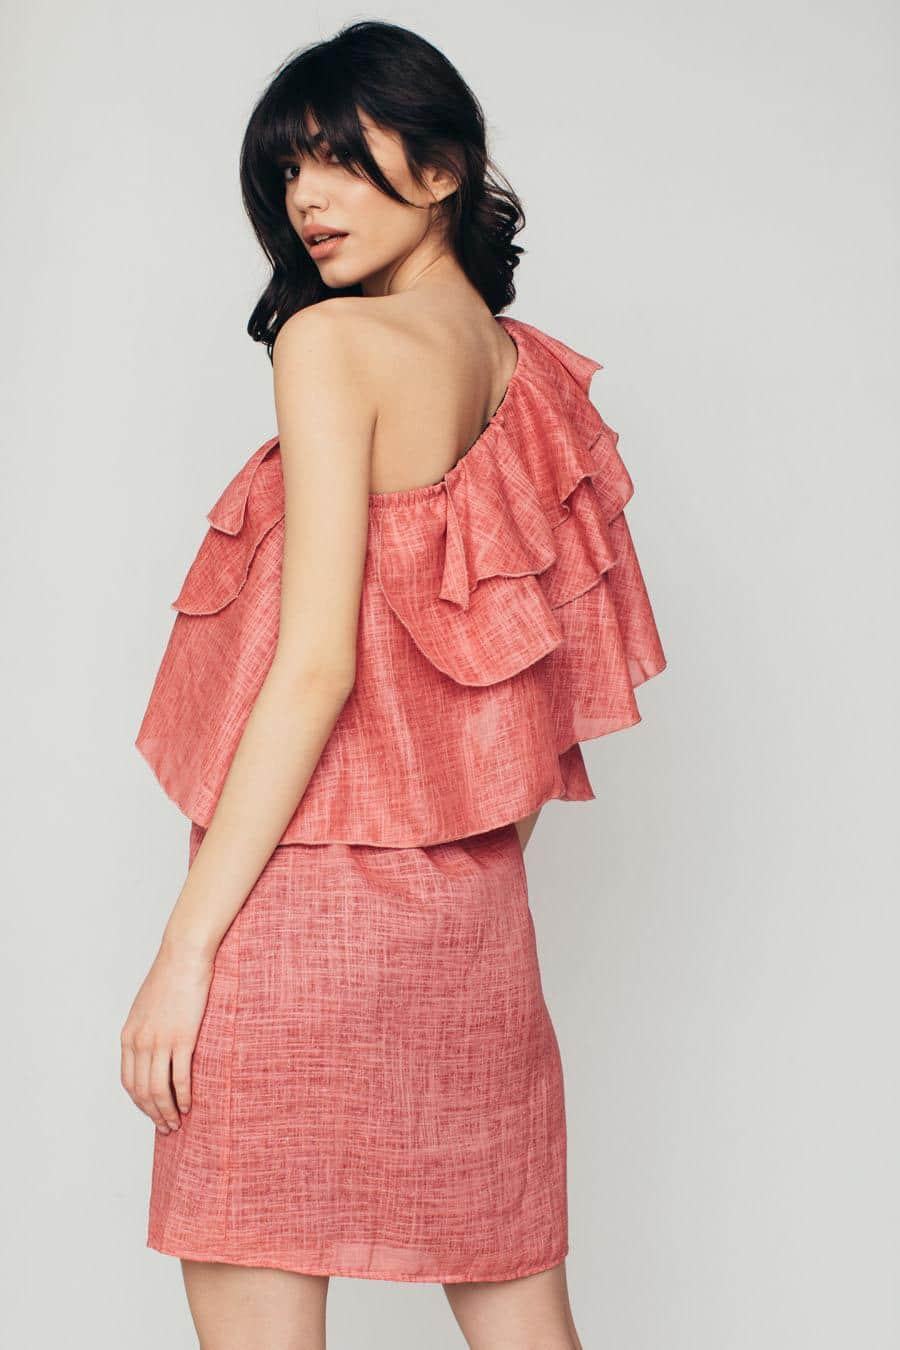 jagger zenska haljina kolekcija prolece leto 2021 ss 2021 kupi online jg 5504 10 01